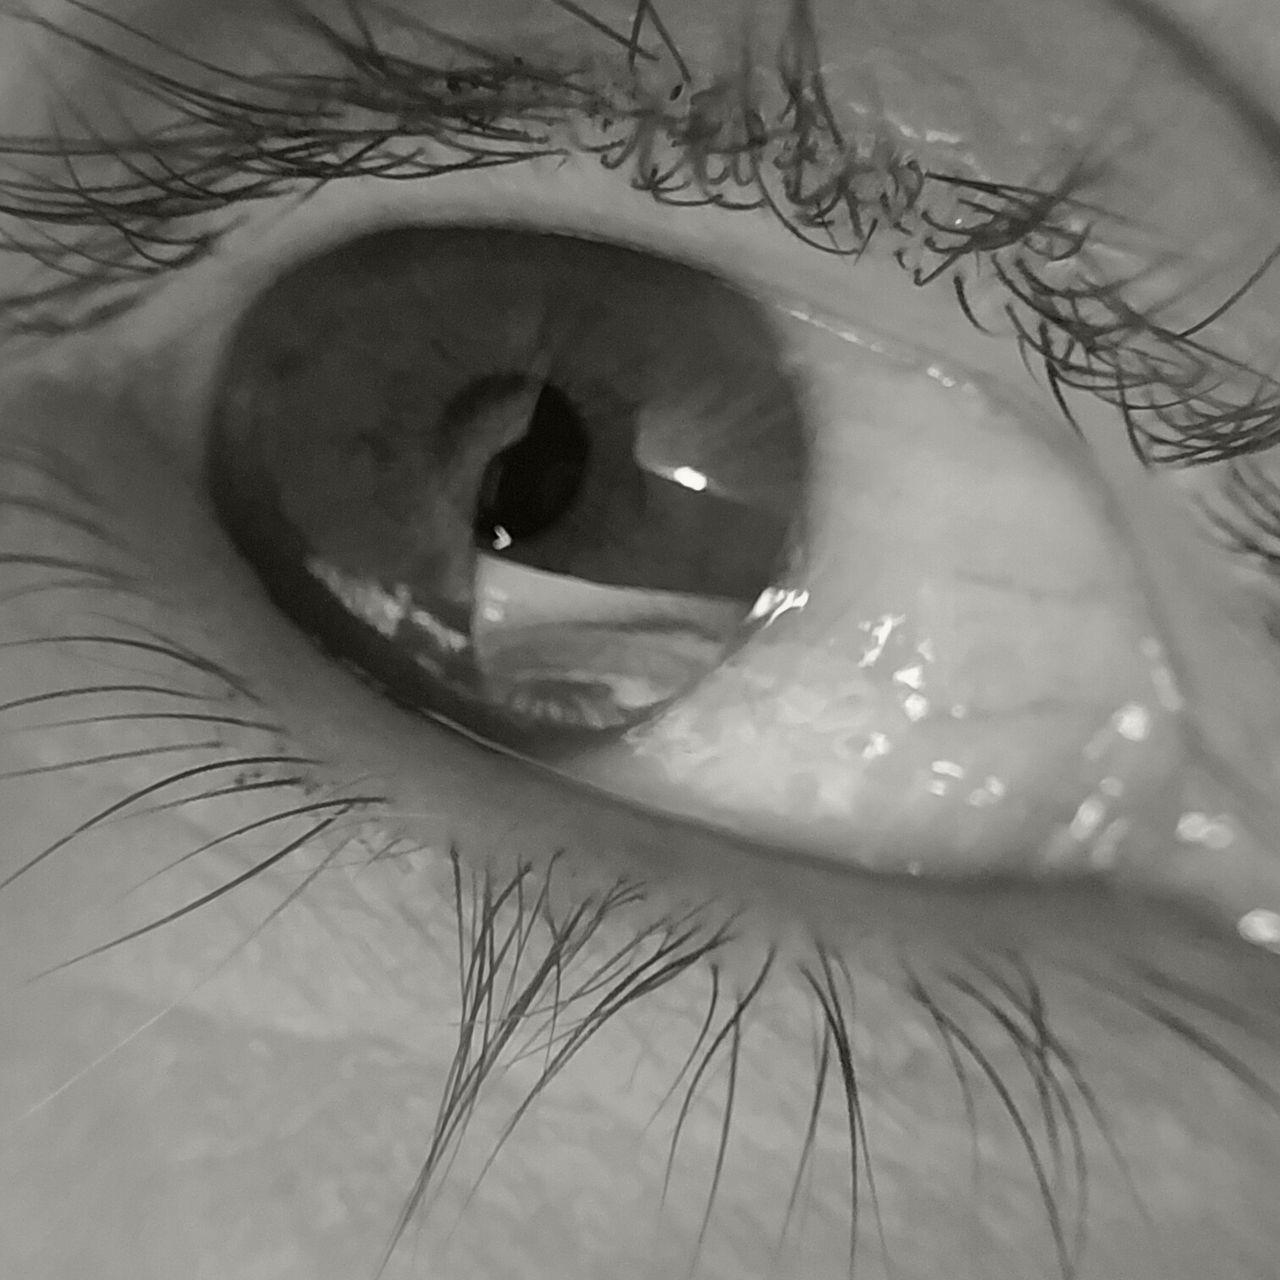 Black And White Body Part Close-up Day Eye Eyeball Eyelash Eyesight Human Body Part Human Eye Human Skin Iris - Eye Macro MUR B&W One Person Outdoors People Portrait Real People Sensory Perception The Portraitist - 2017 EyeEm Awards Woman